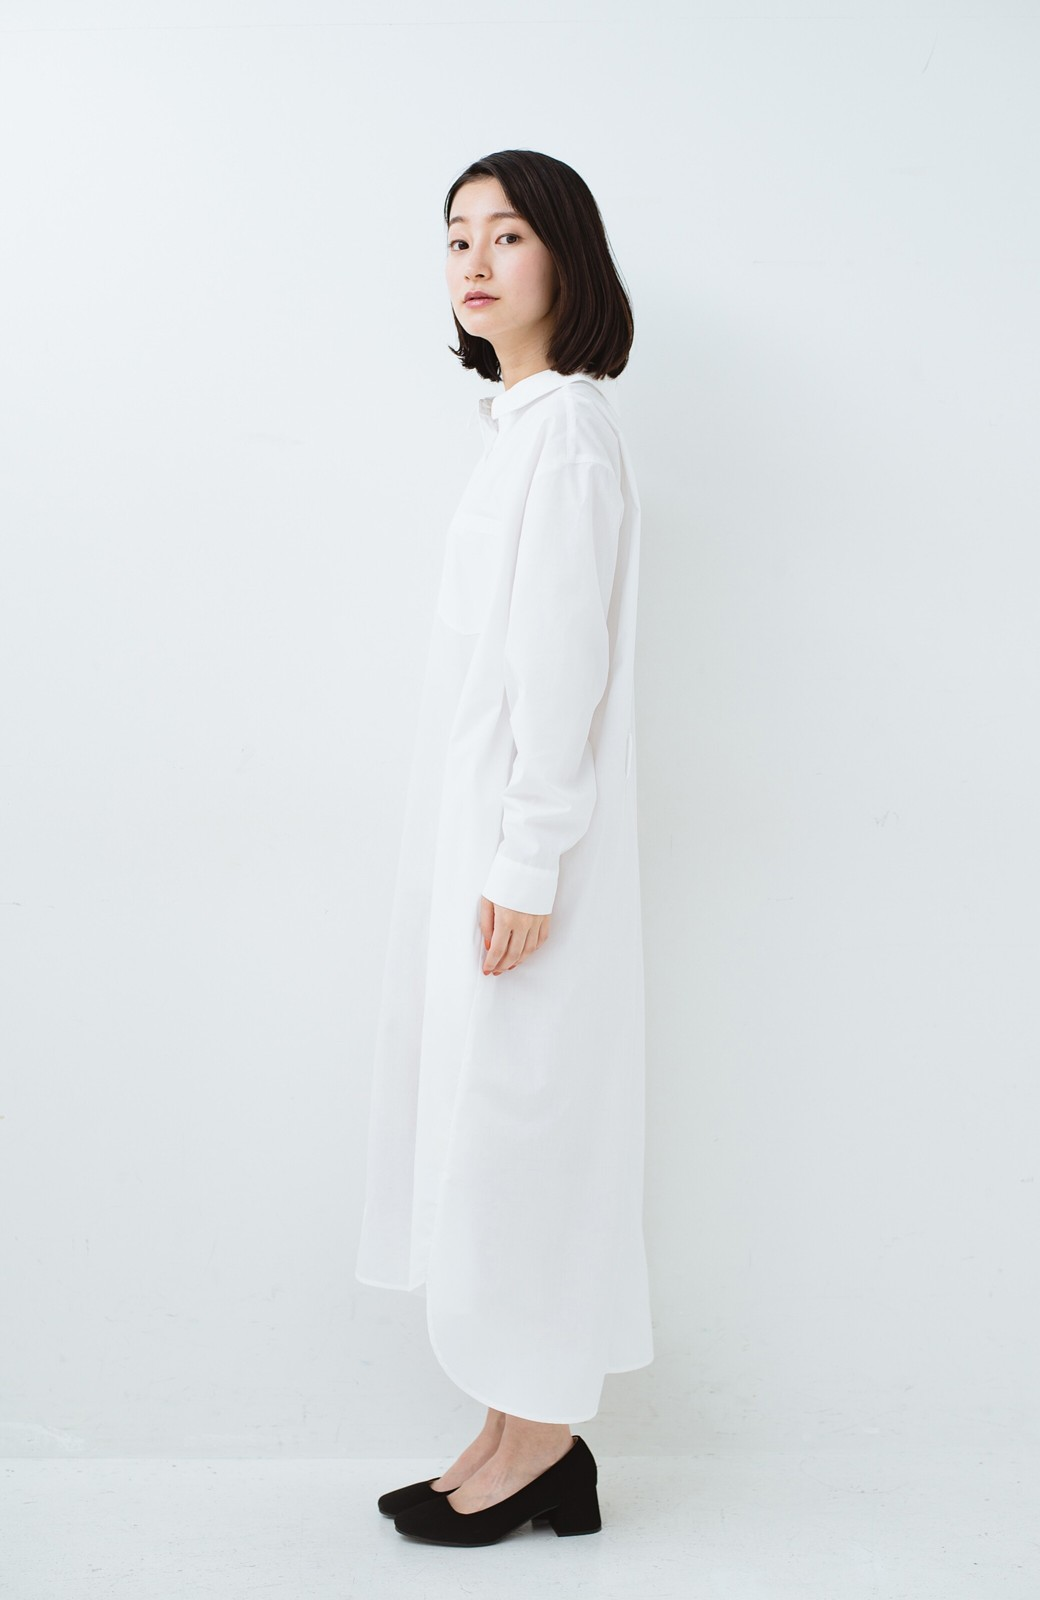 haco! 気持ちが凛と改まる リボン付きオーバーサイズシャツワンピース <ホワイト>の商品写真14